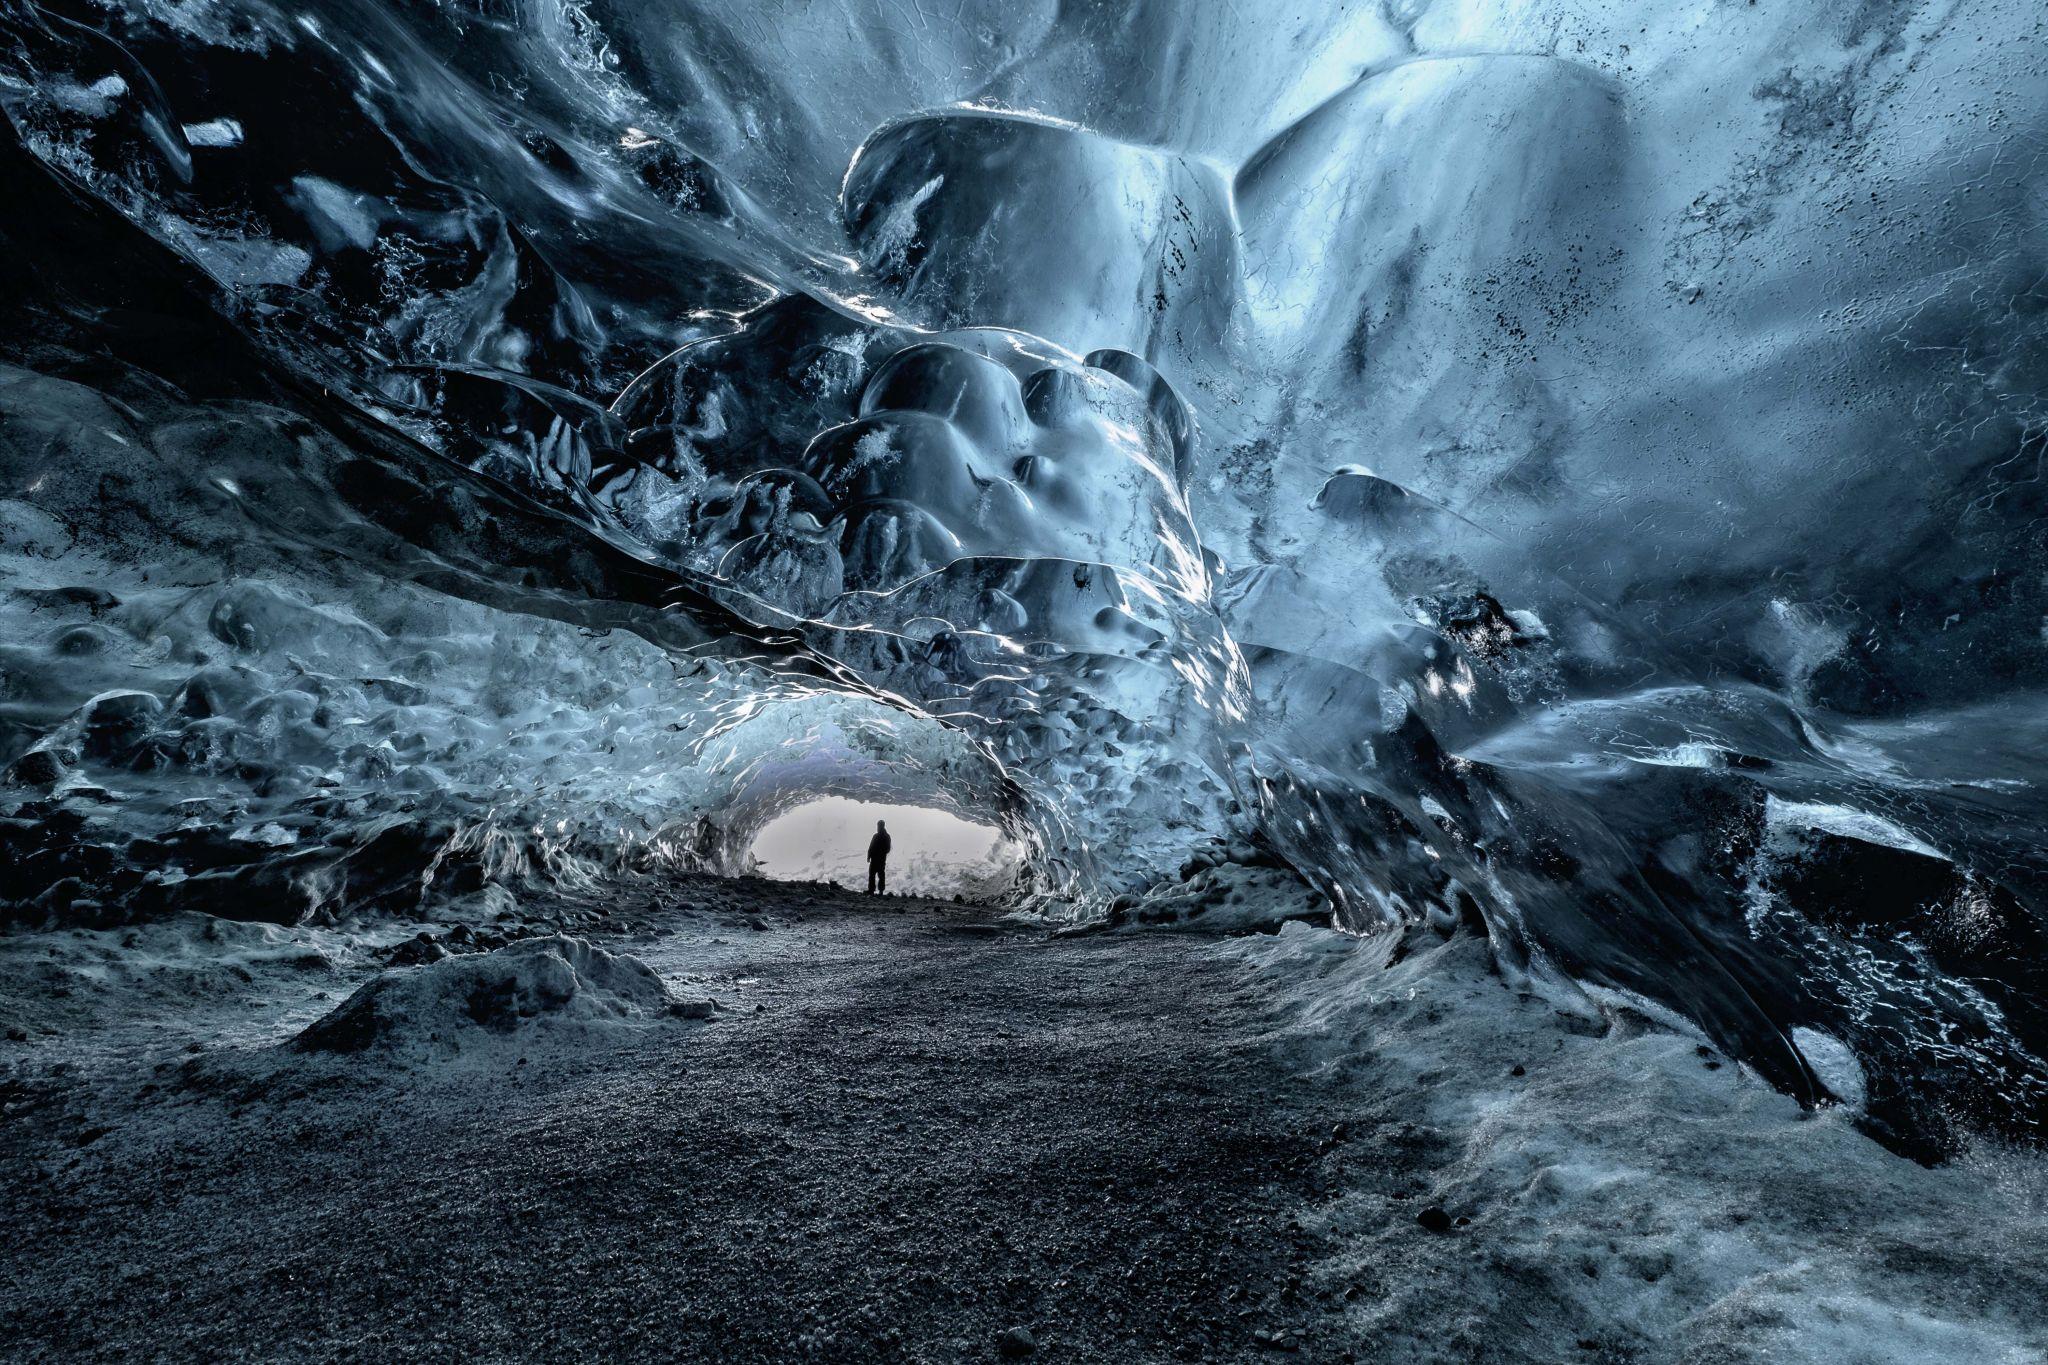 Vatnajokull Icecave, Iceland